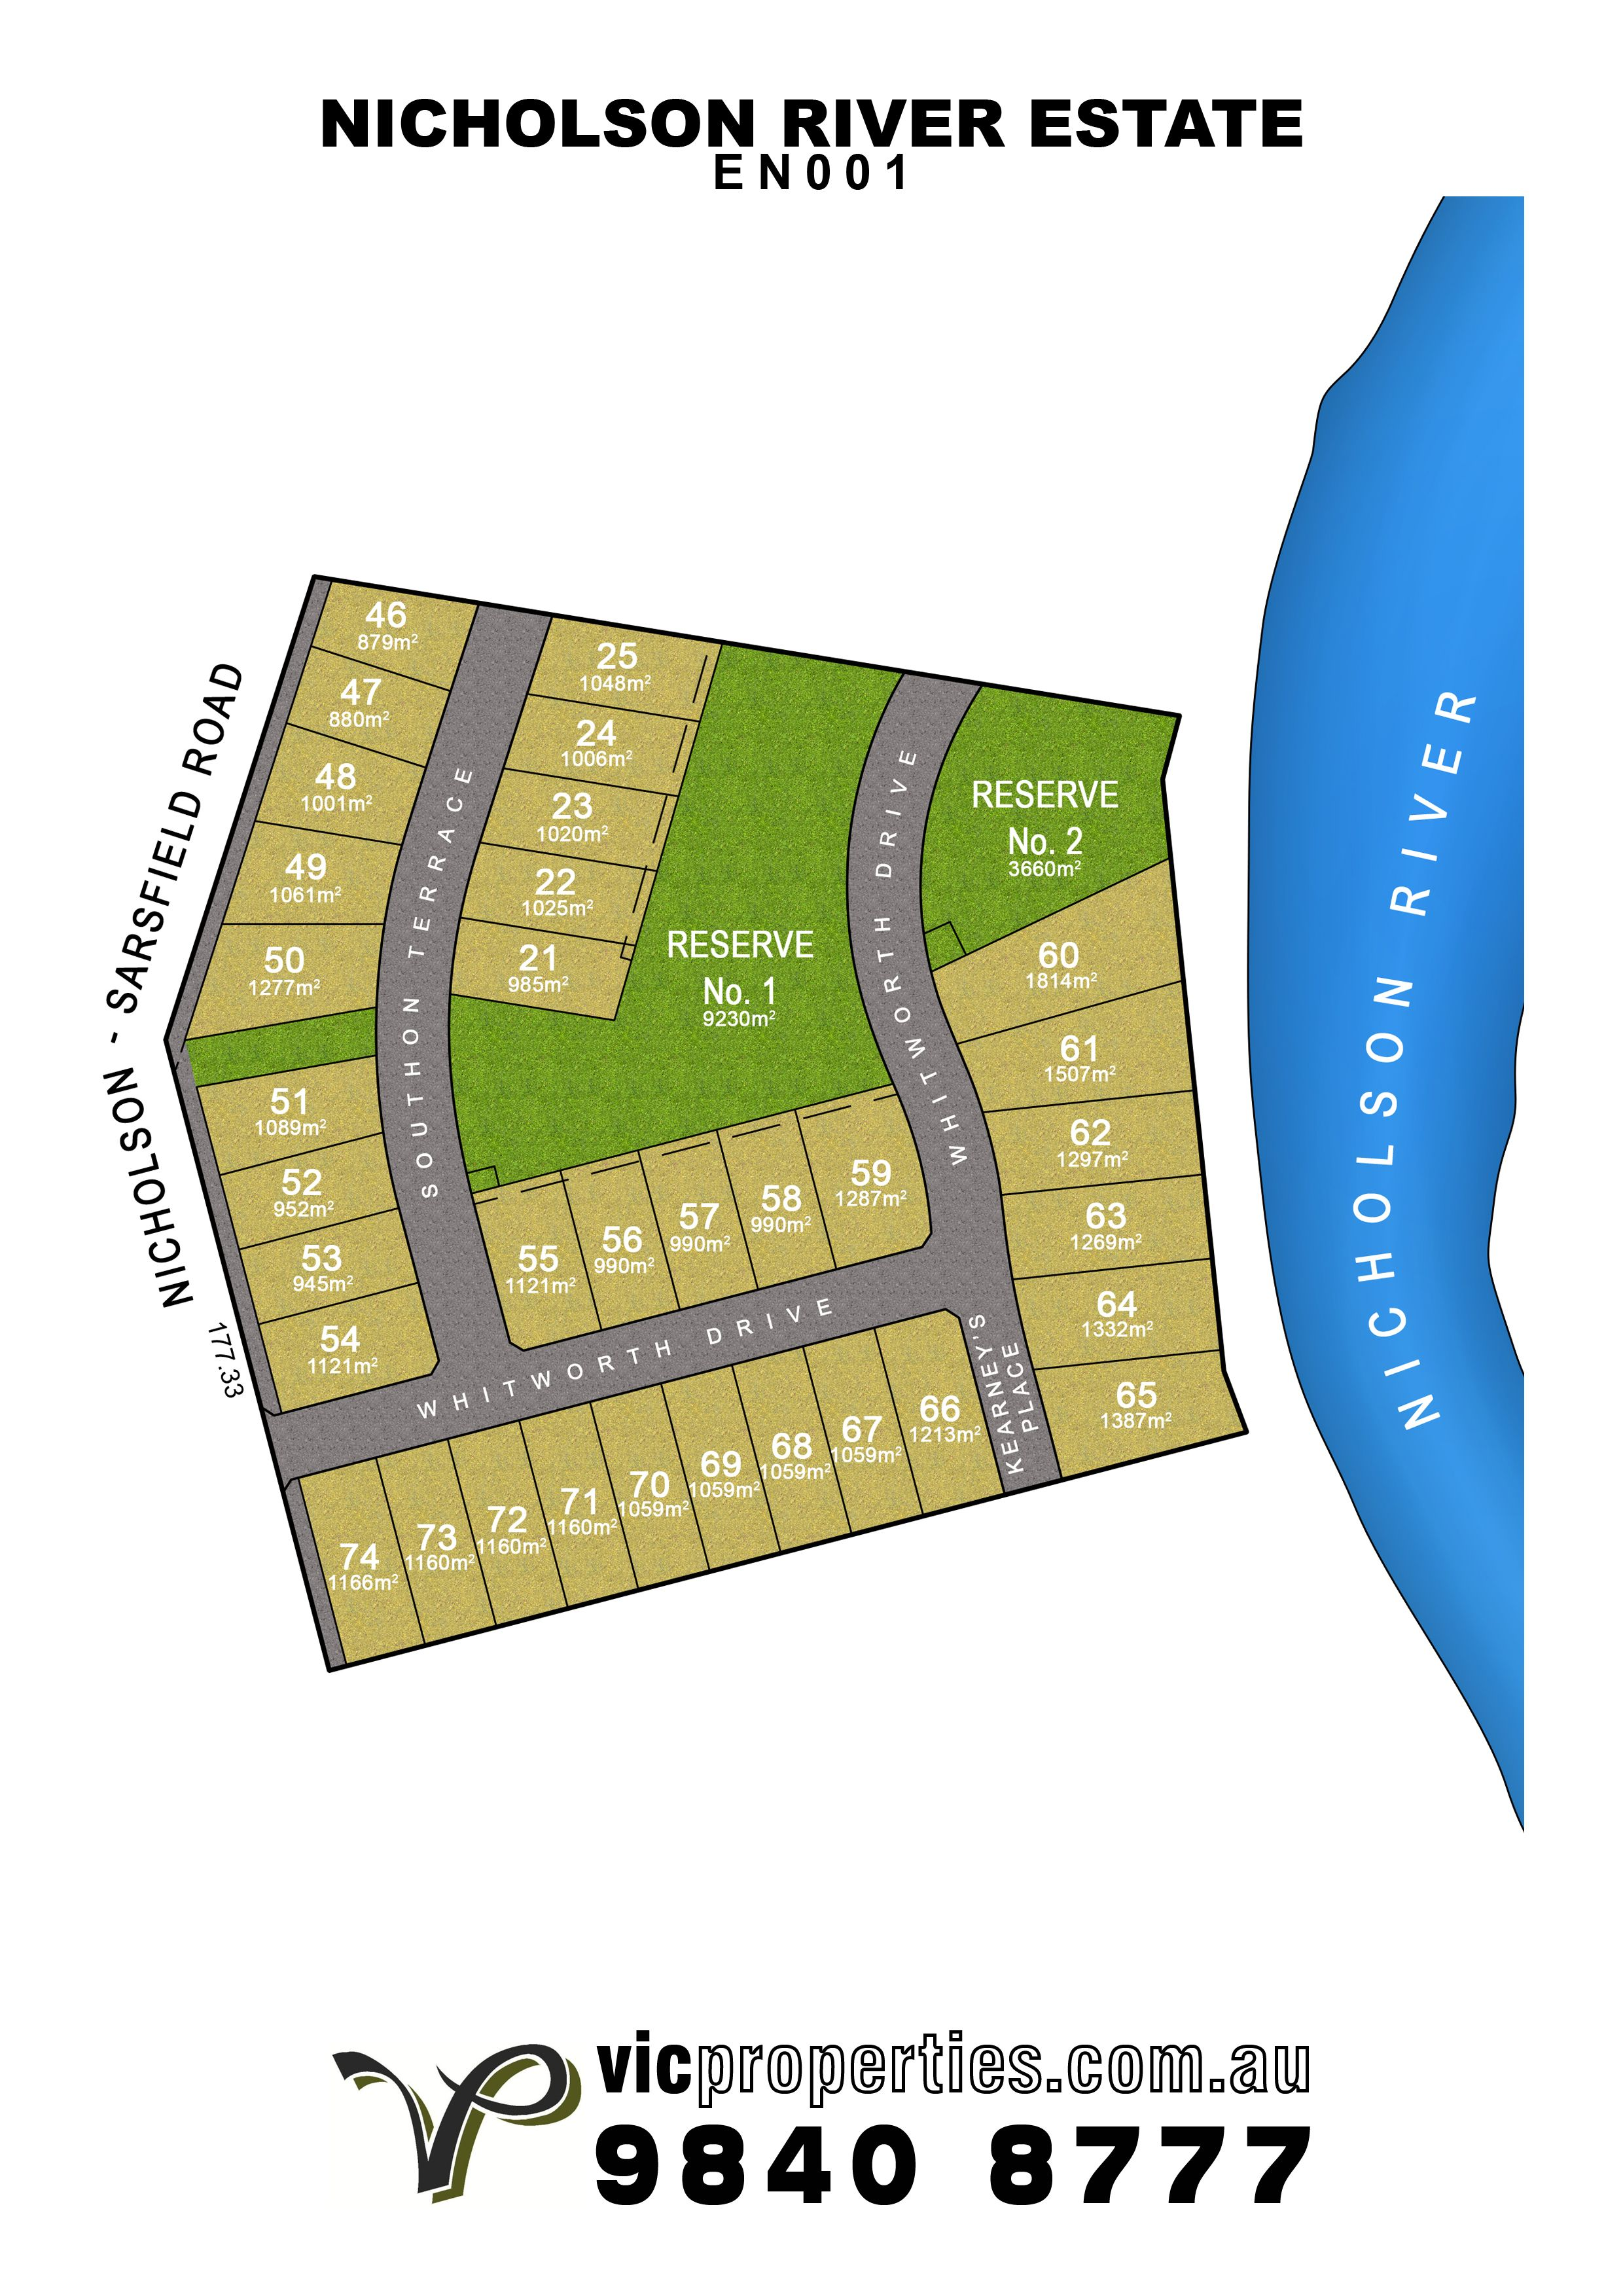 Lot 65/3 Kearneys Place, Nicholson VIC 3882